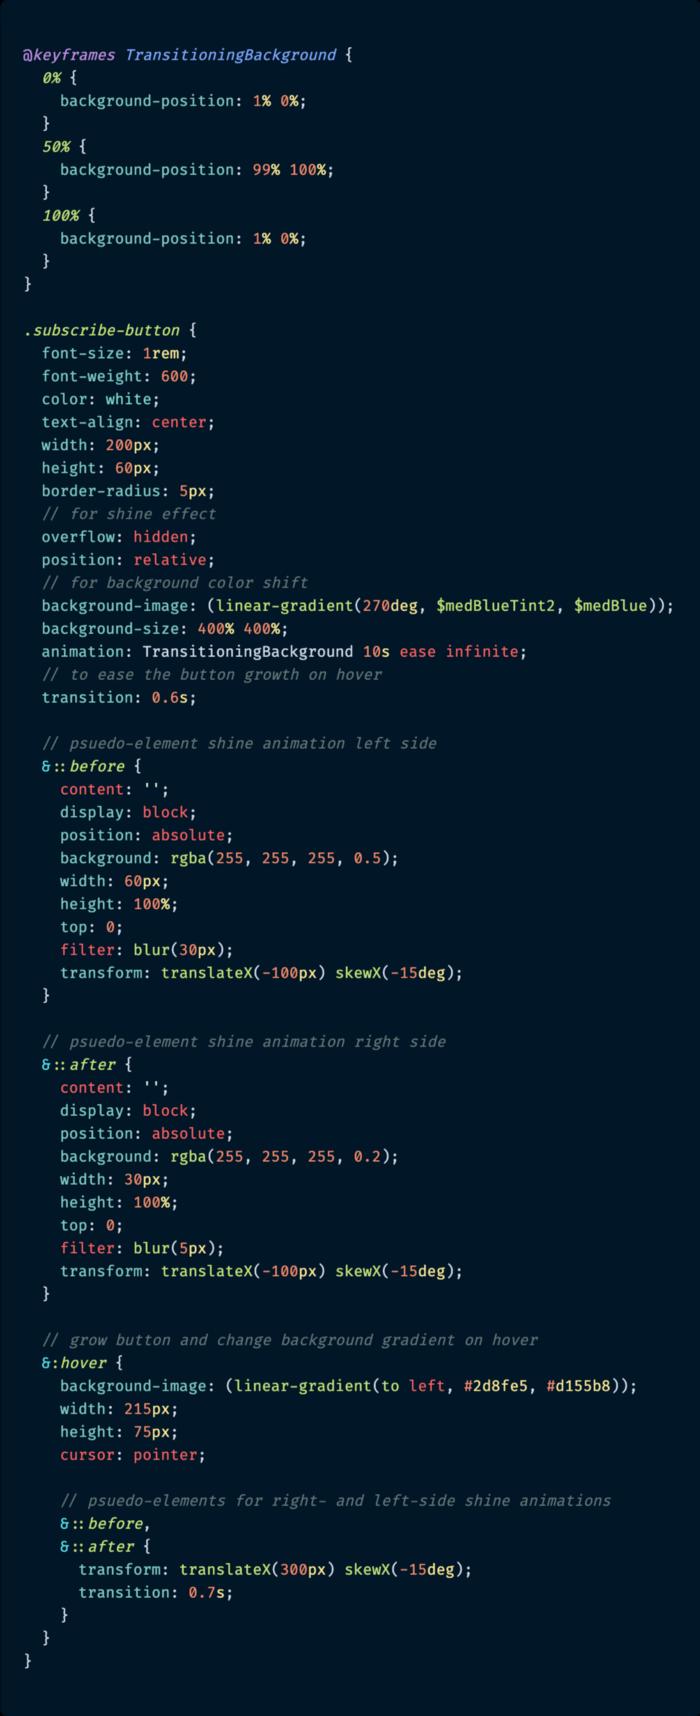 CSS کامل دکمه - متشکل از طراحی ظاهر اولیه، گرادینتهای پس زمینه و جلوه درخشان.